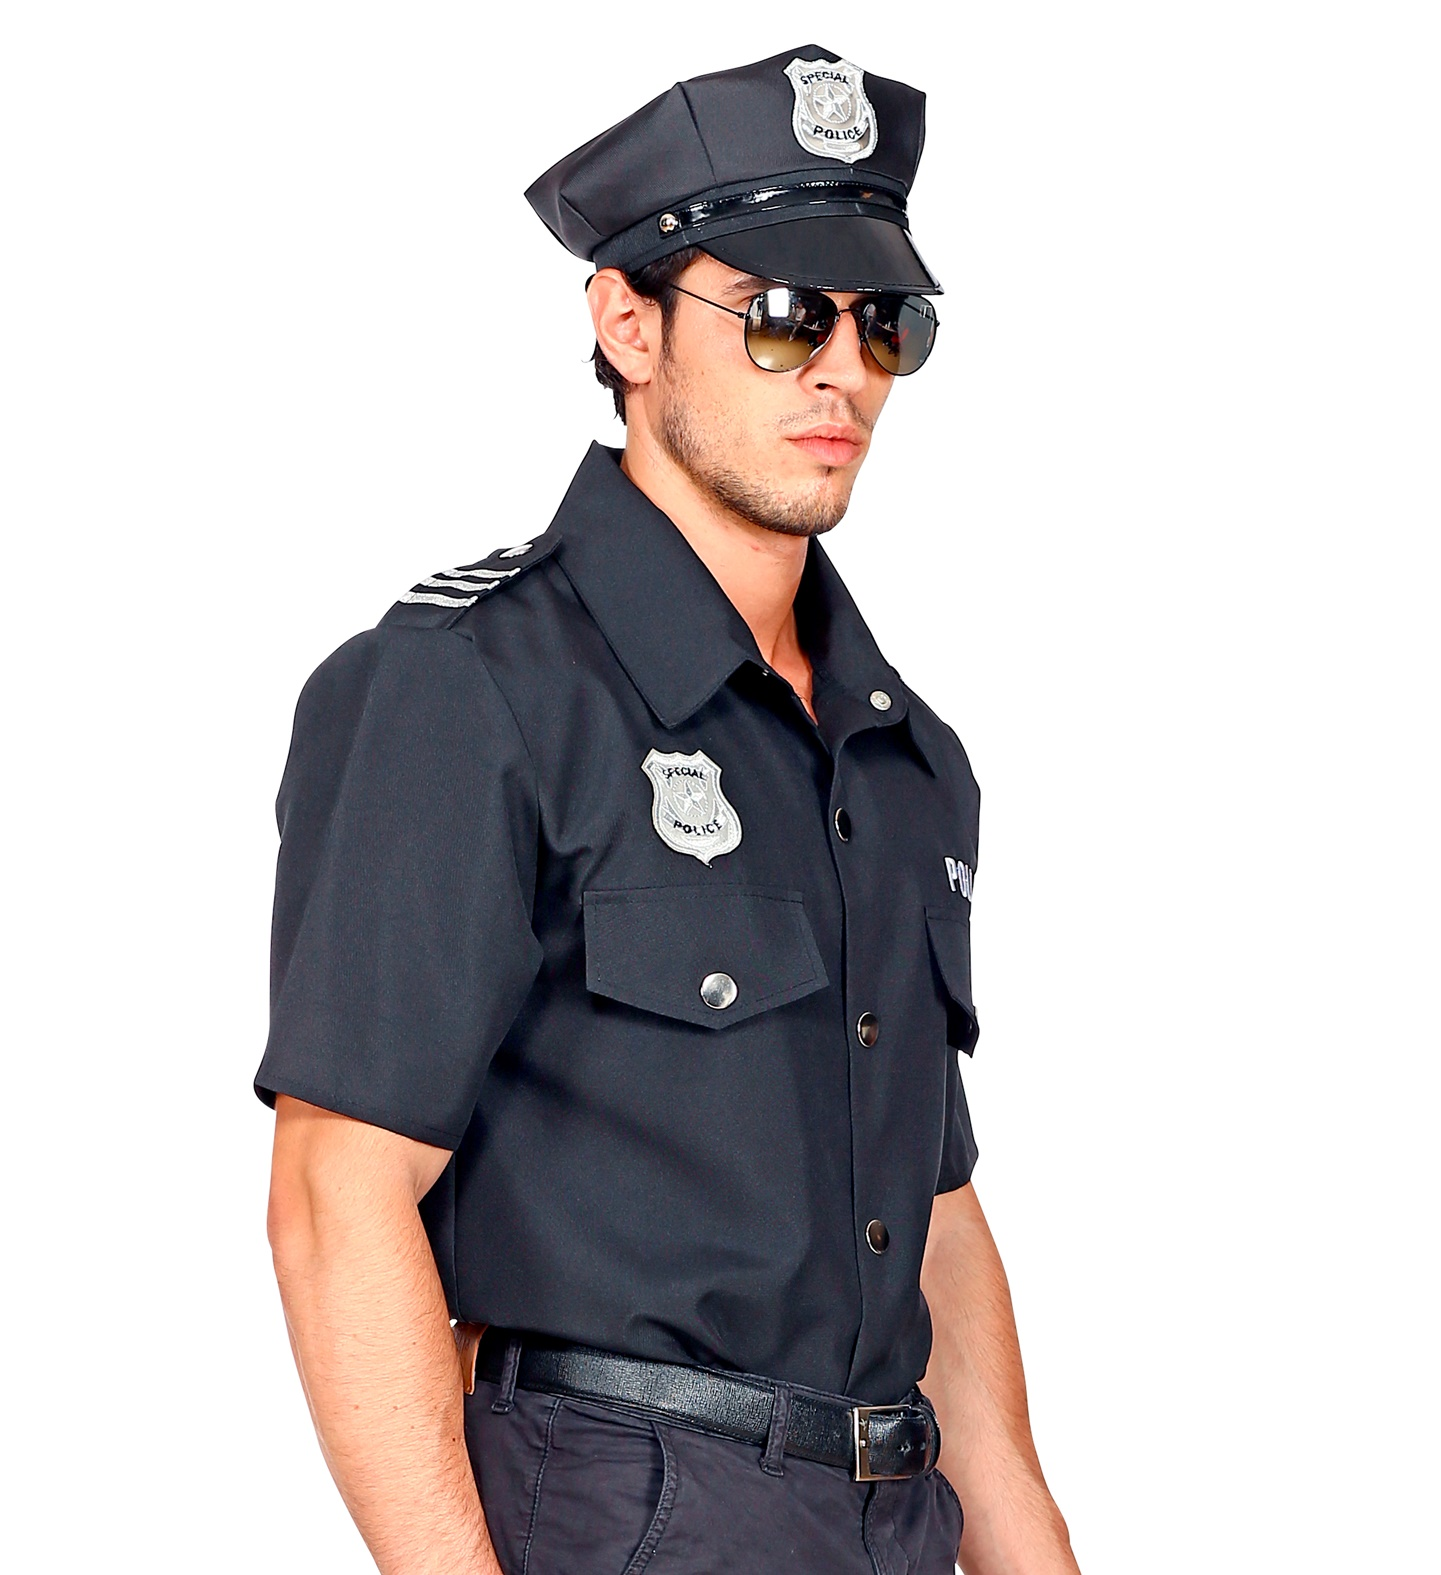 Polizei Hemd Blau